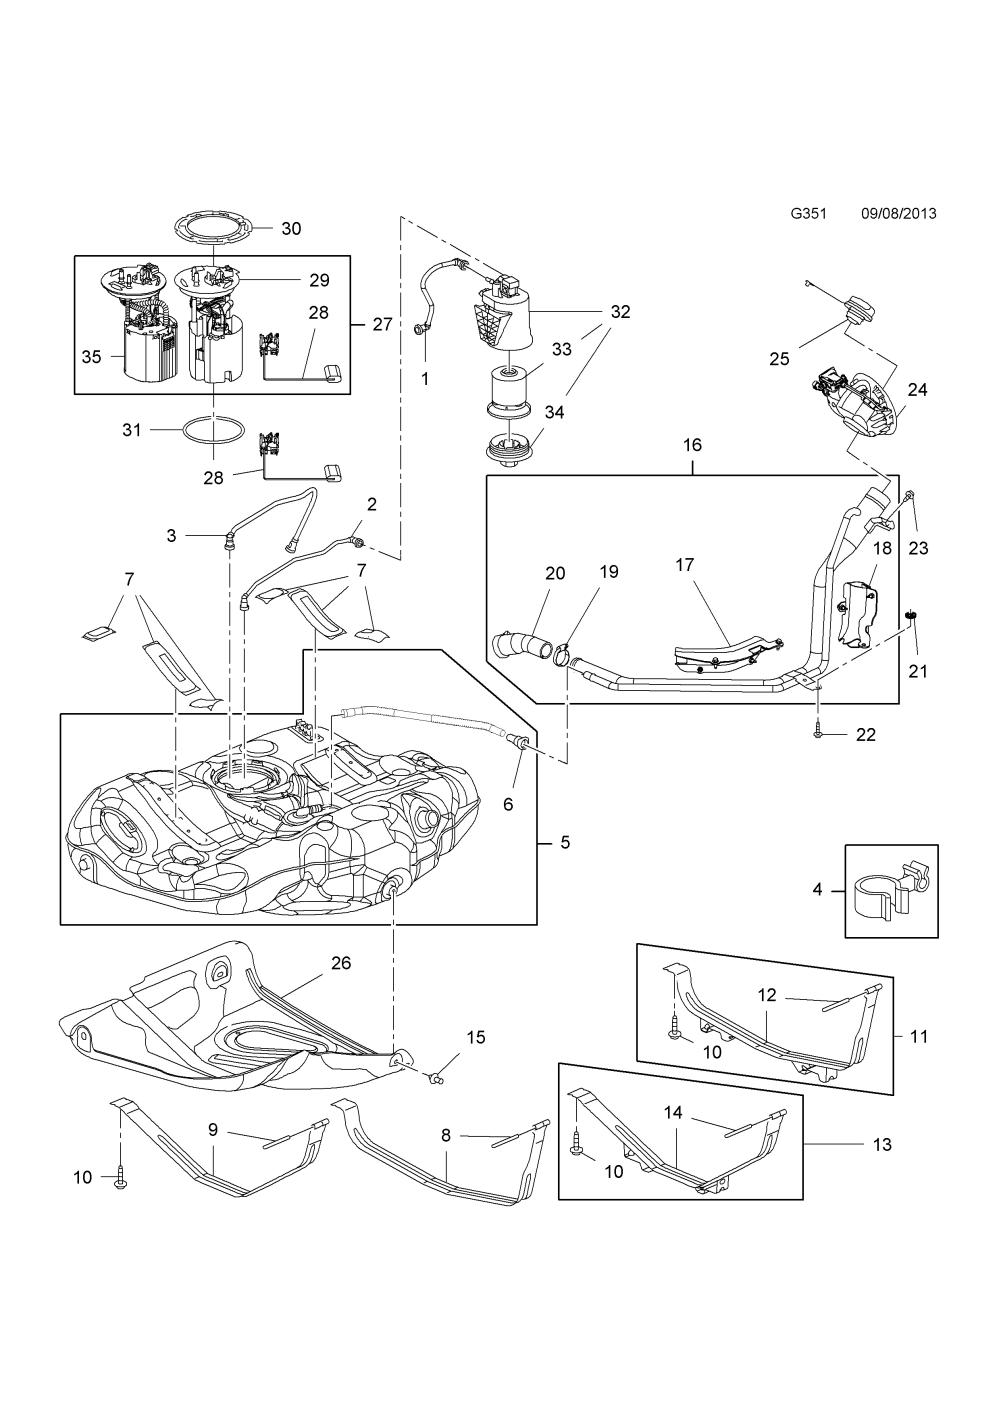 medium resolution of vauxhall fuel pump diagram schema wiring diagram opel fuel pump diagram